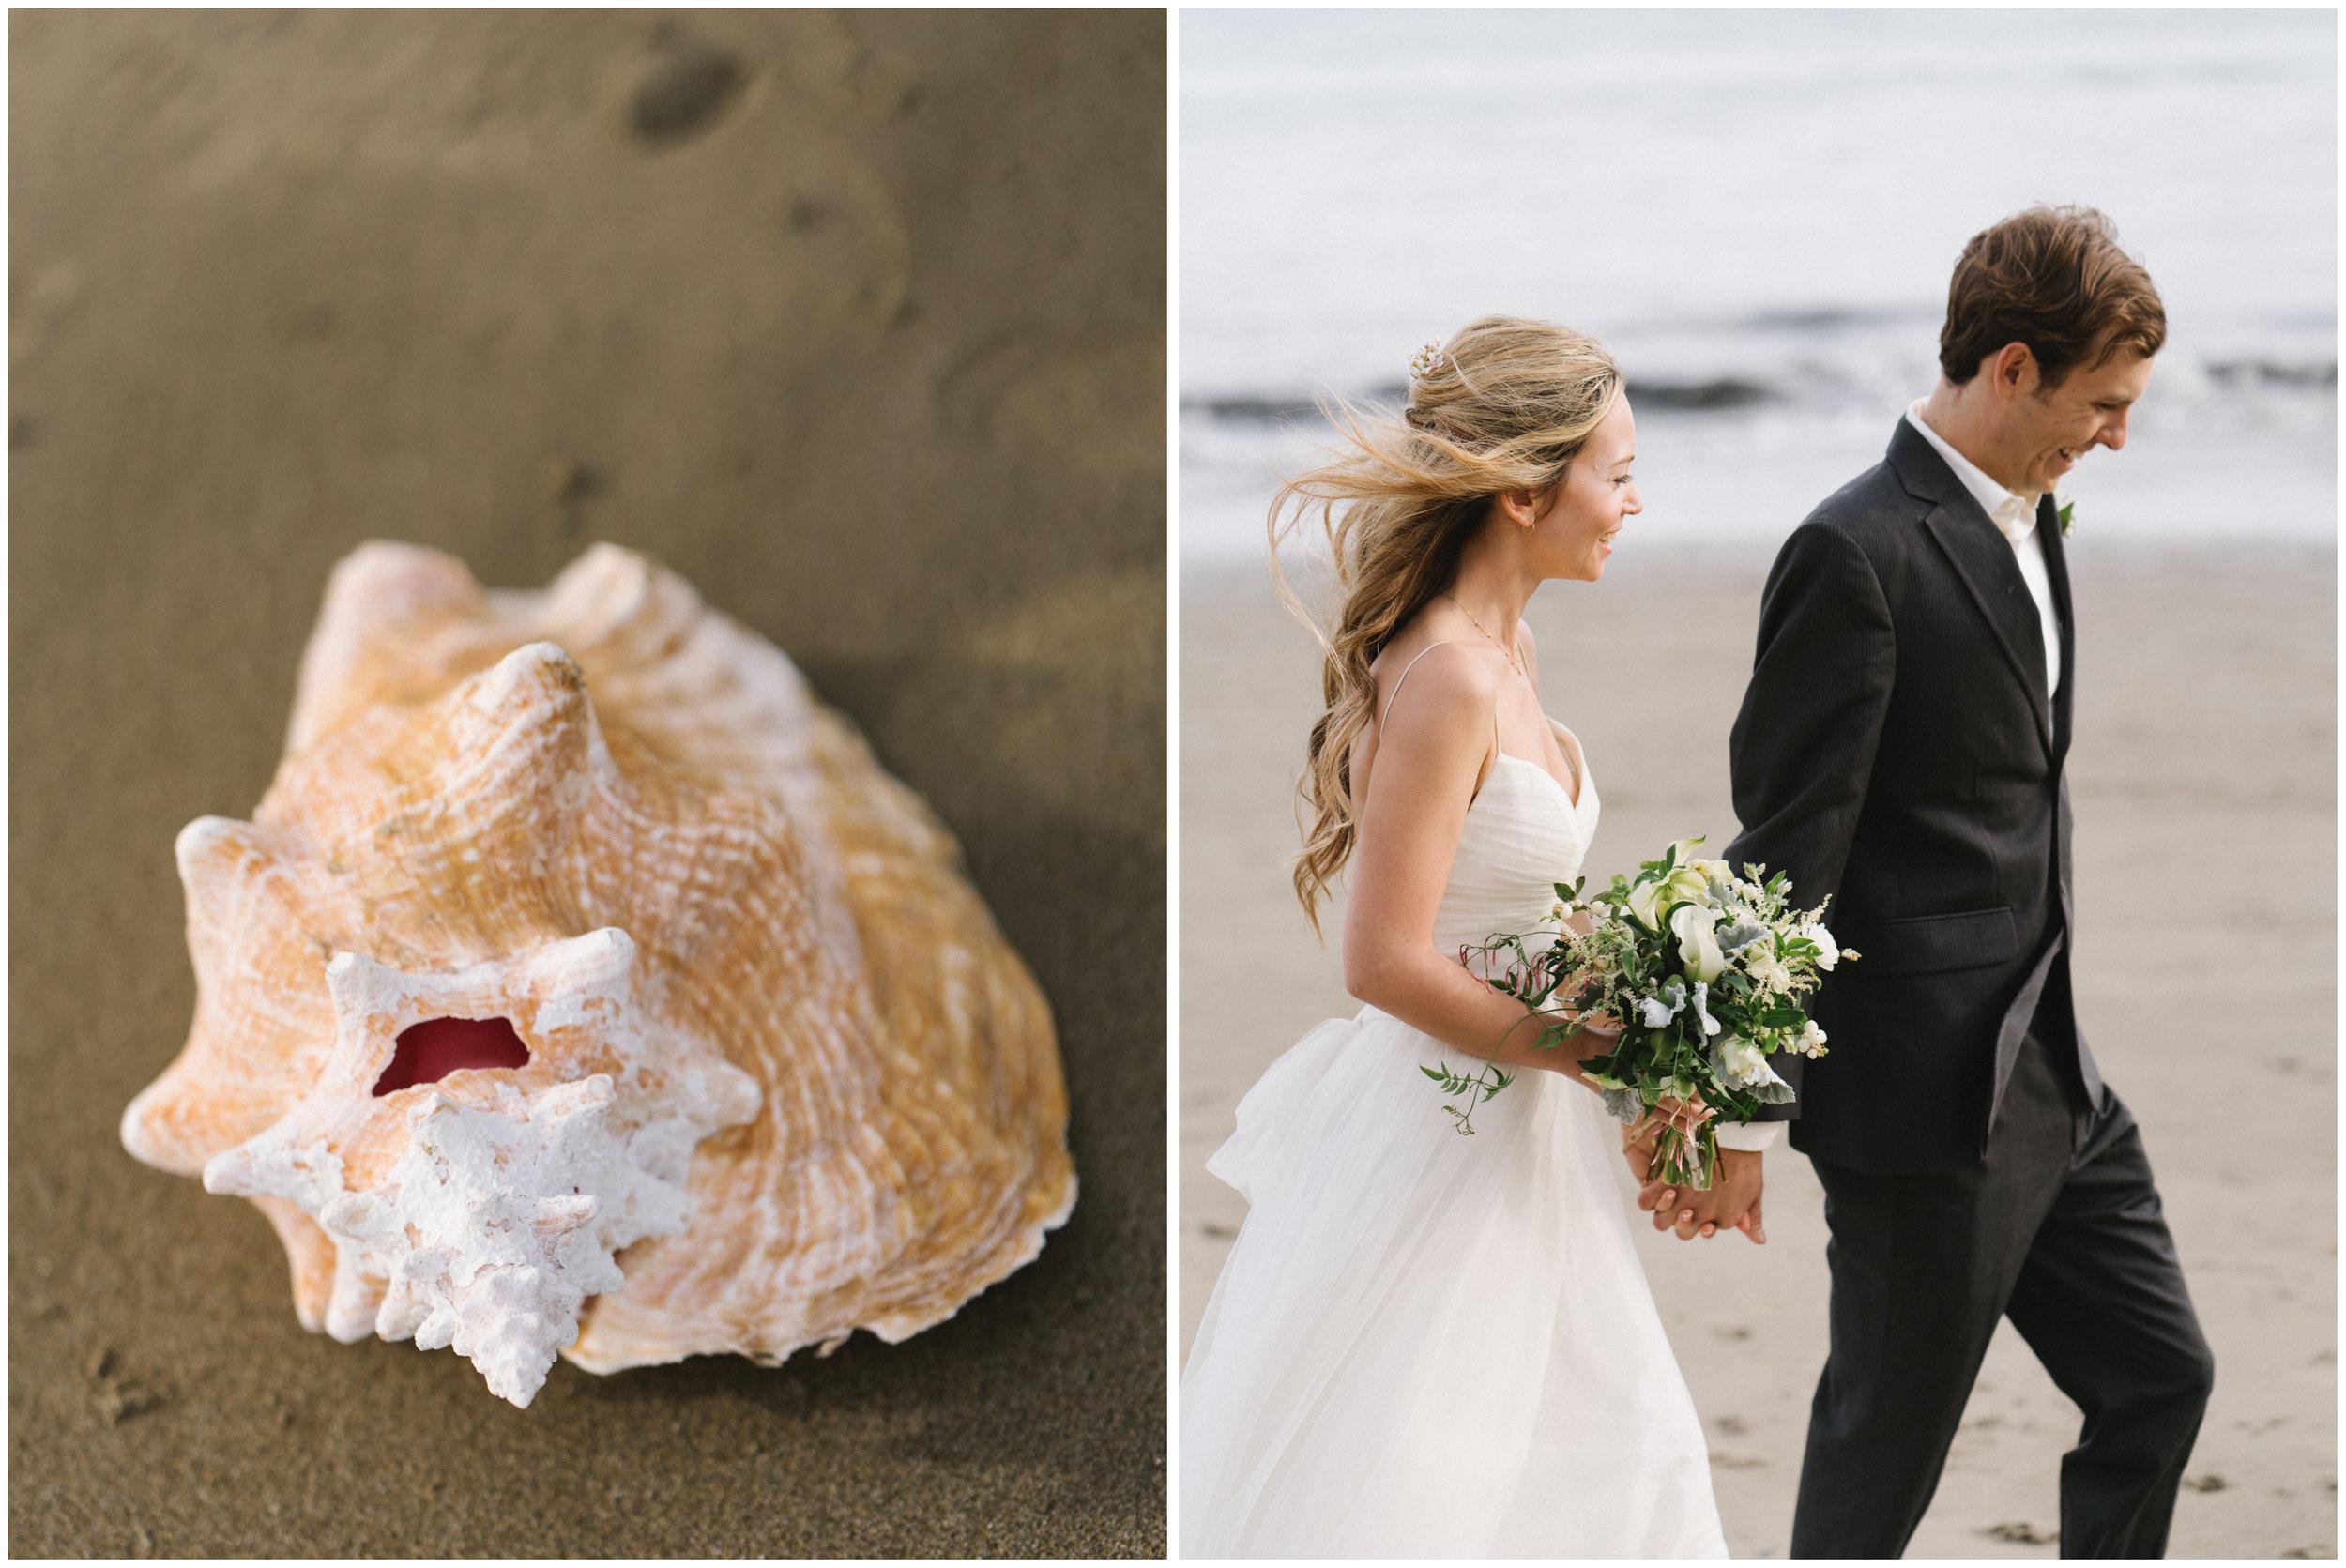 Santa Barbara Elopement Wedding Photographer - Pinnel Photography-09.jpg